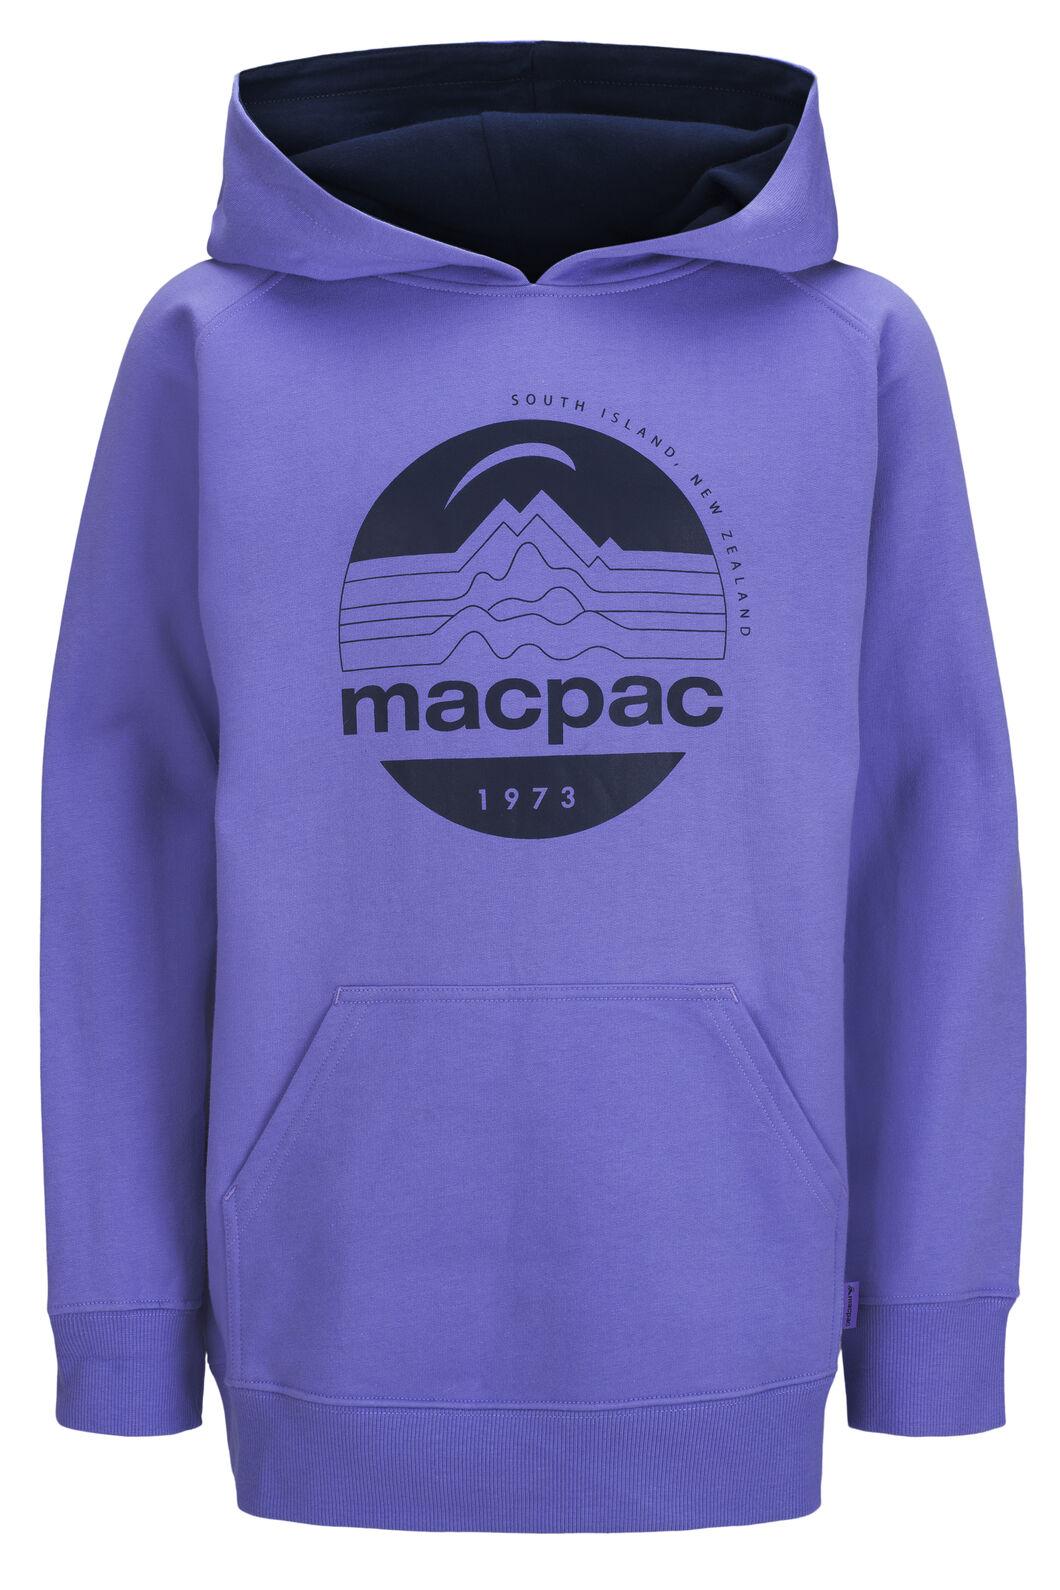 Macpac Kids' Fairtrade Organic Cotton Pullover Hoody, Aster Purple, hi-res